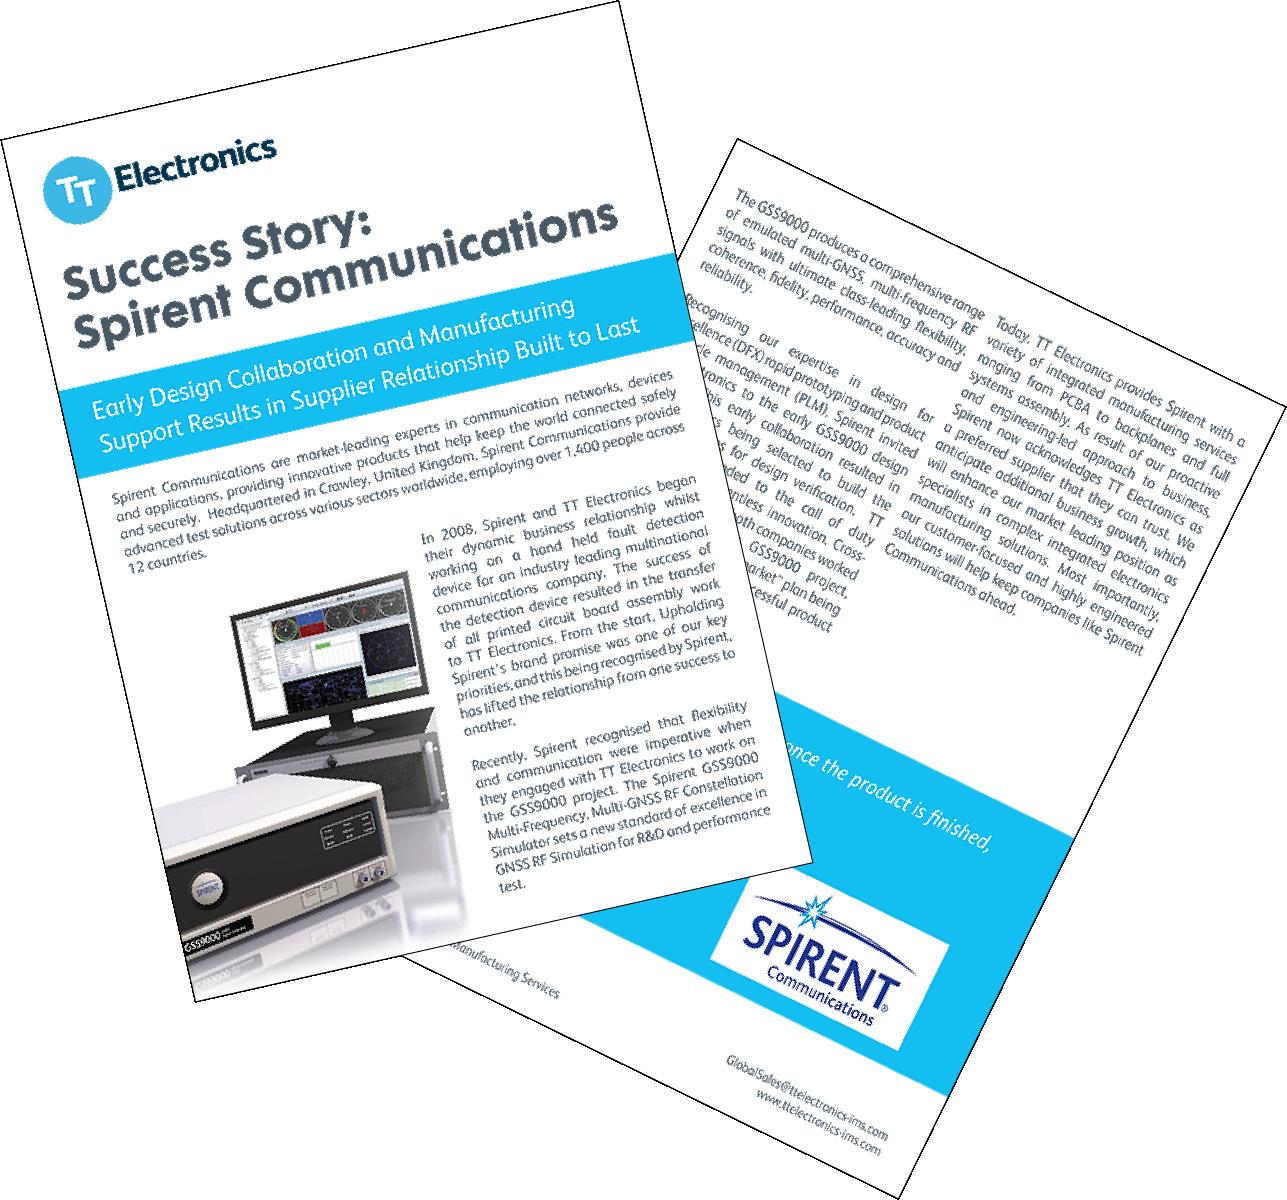 Spirent_Success_Story_Thumbnail.png